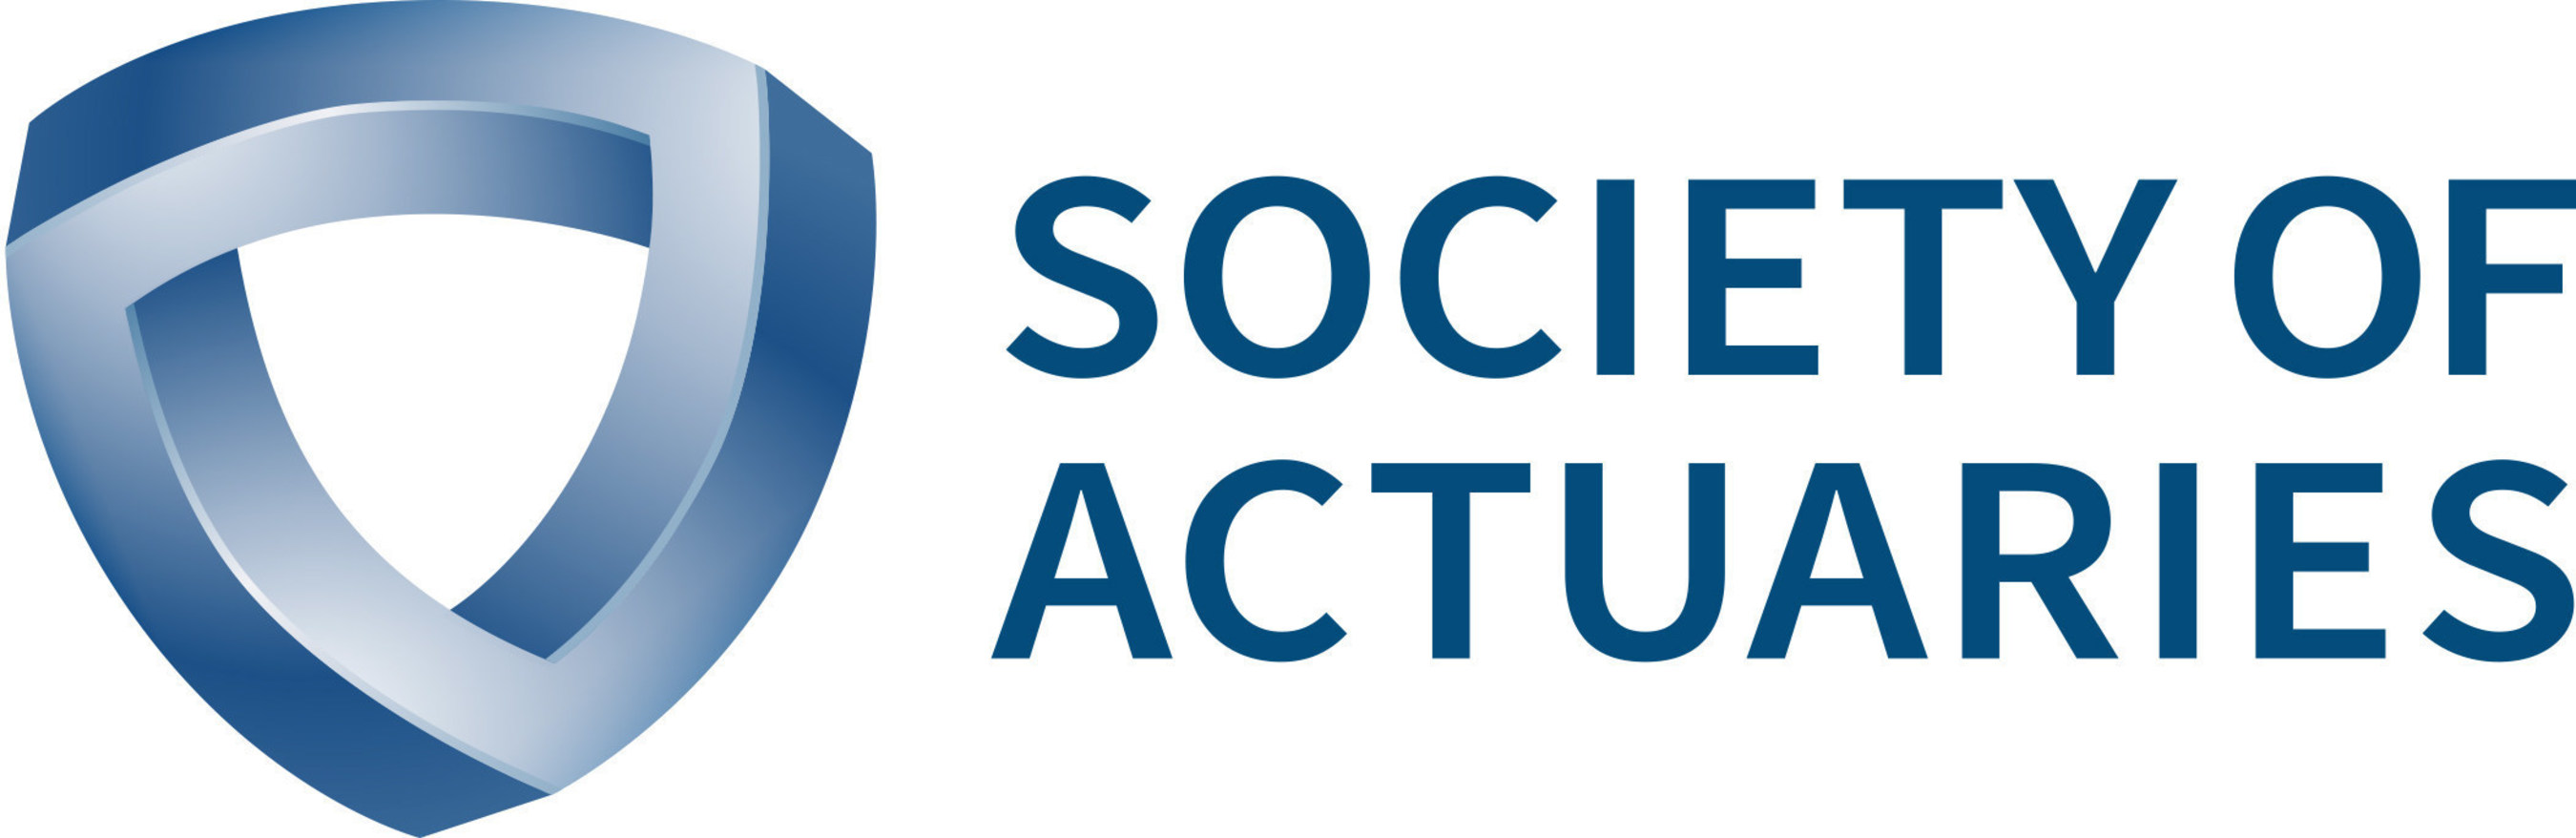 Society of Actuaries.